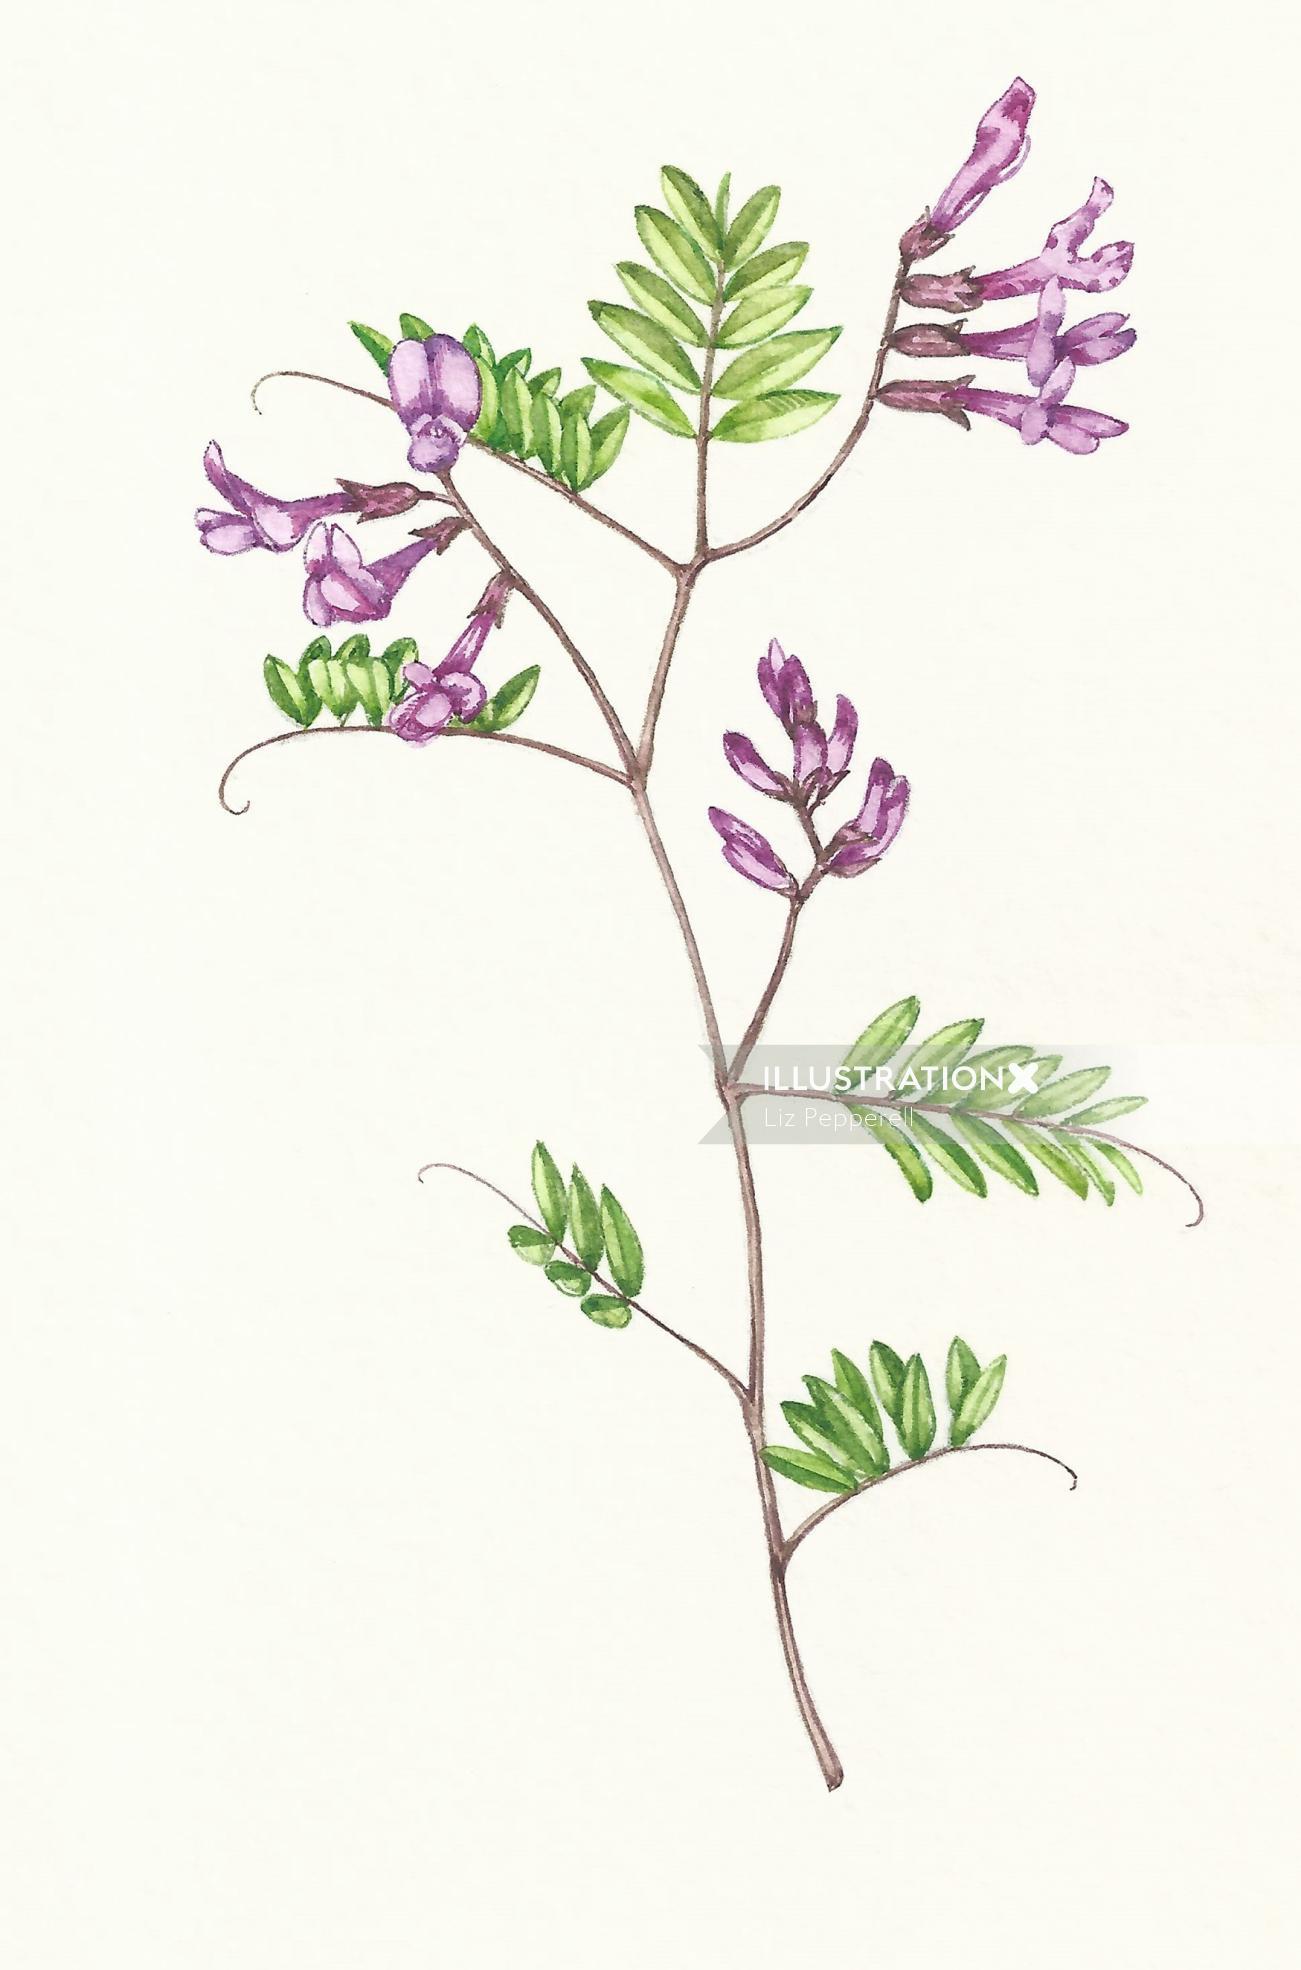 Watercolor art of vetch